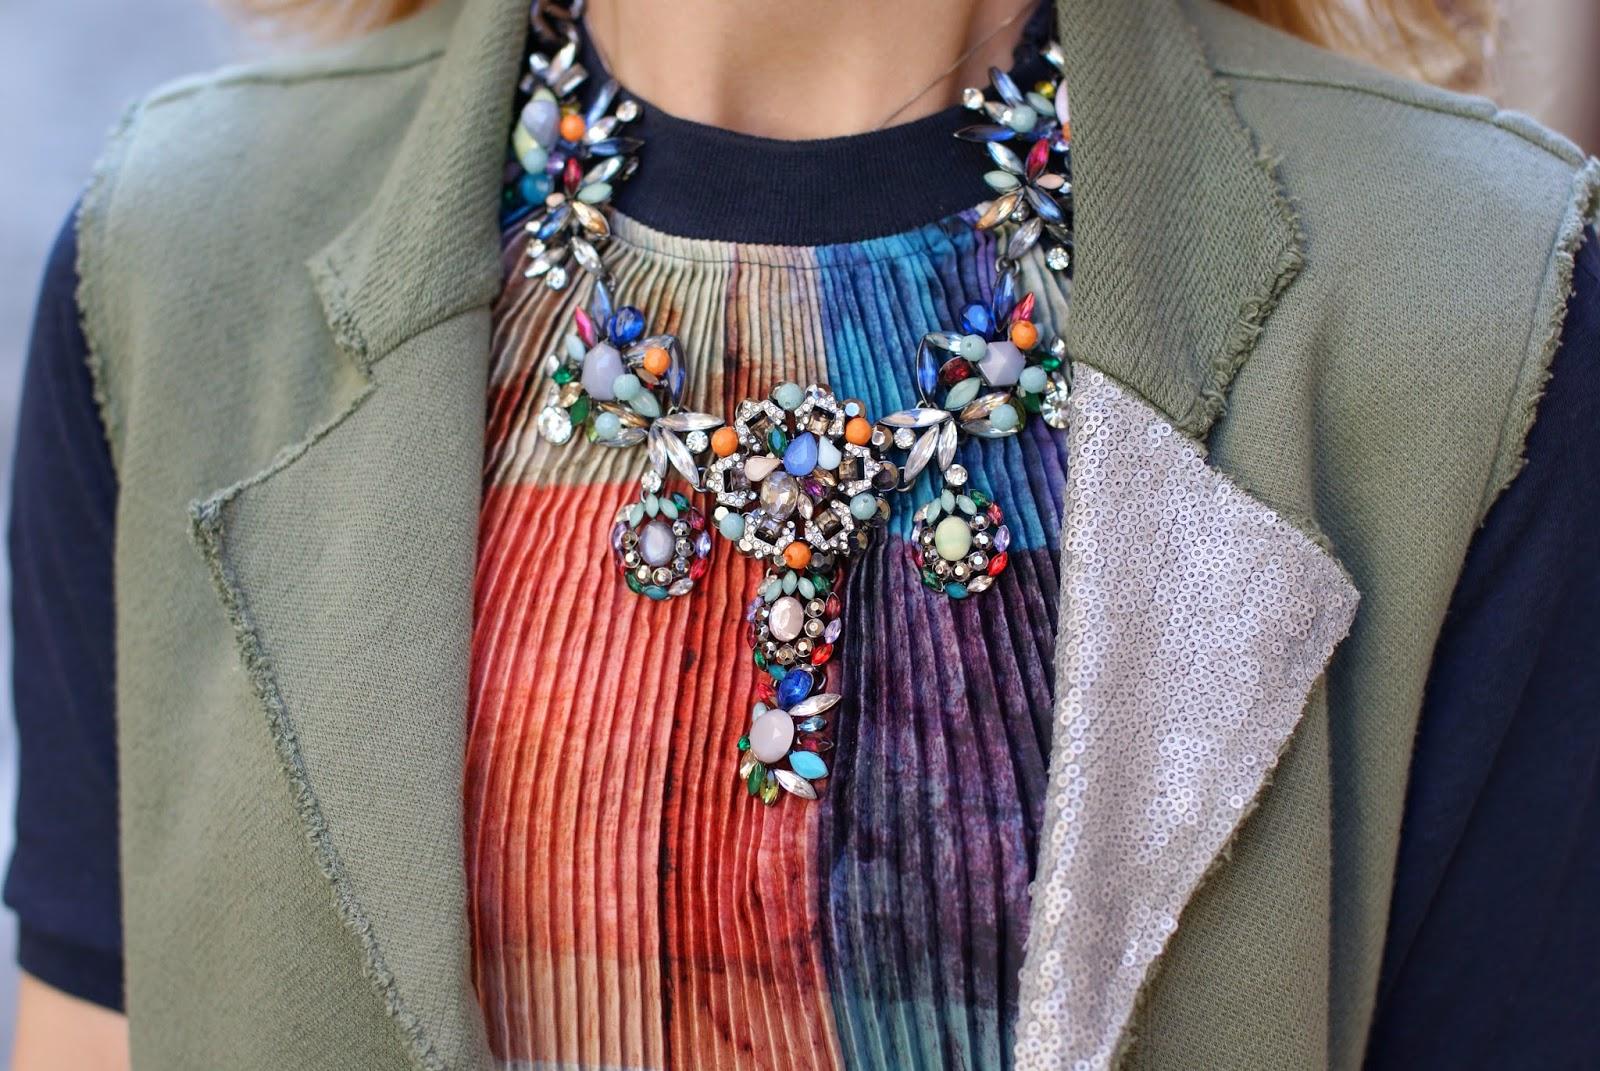 Zara statement necklace, Praio sleeveless jacket, Fashion and Cookies, fashion blogger